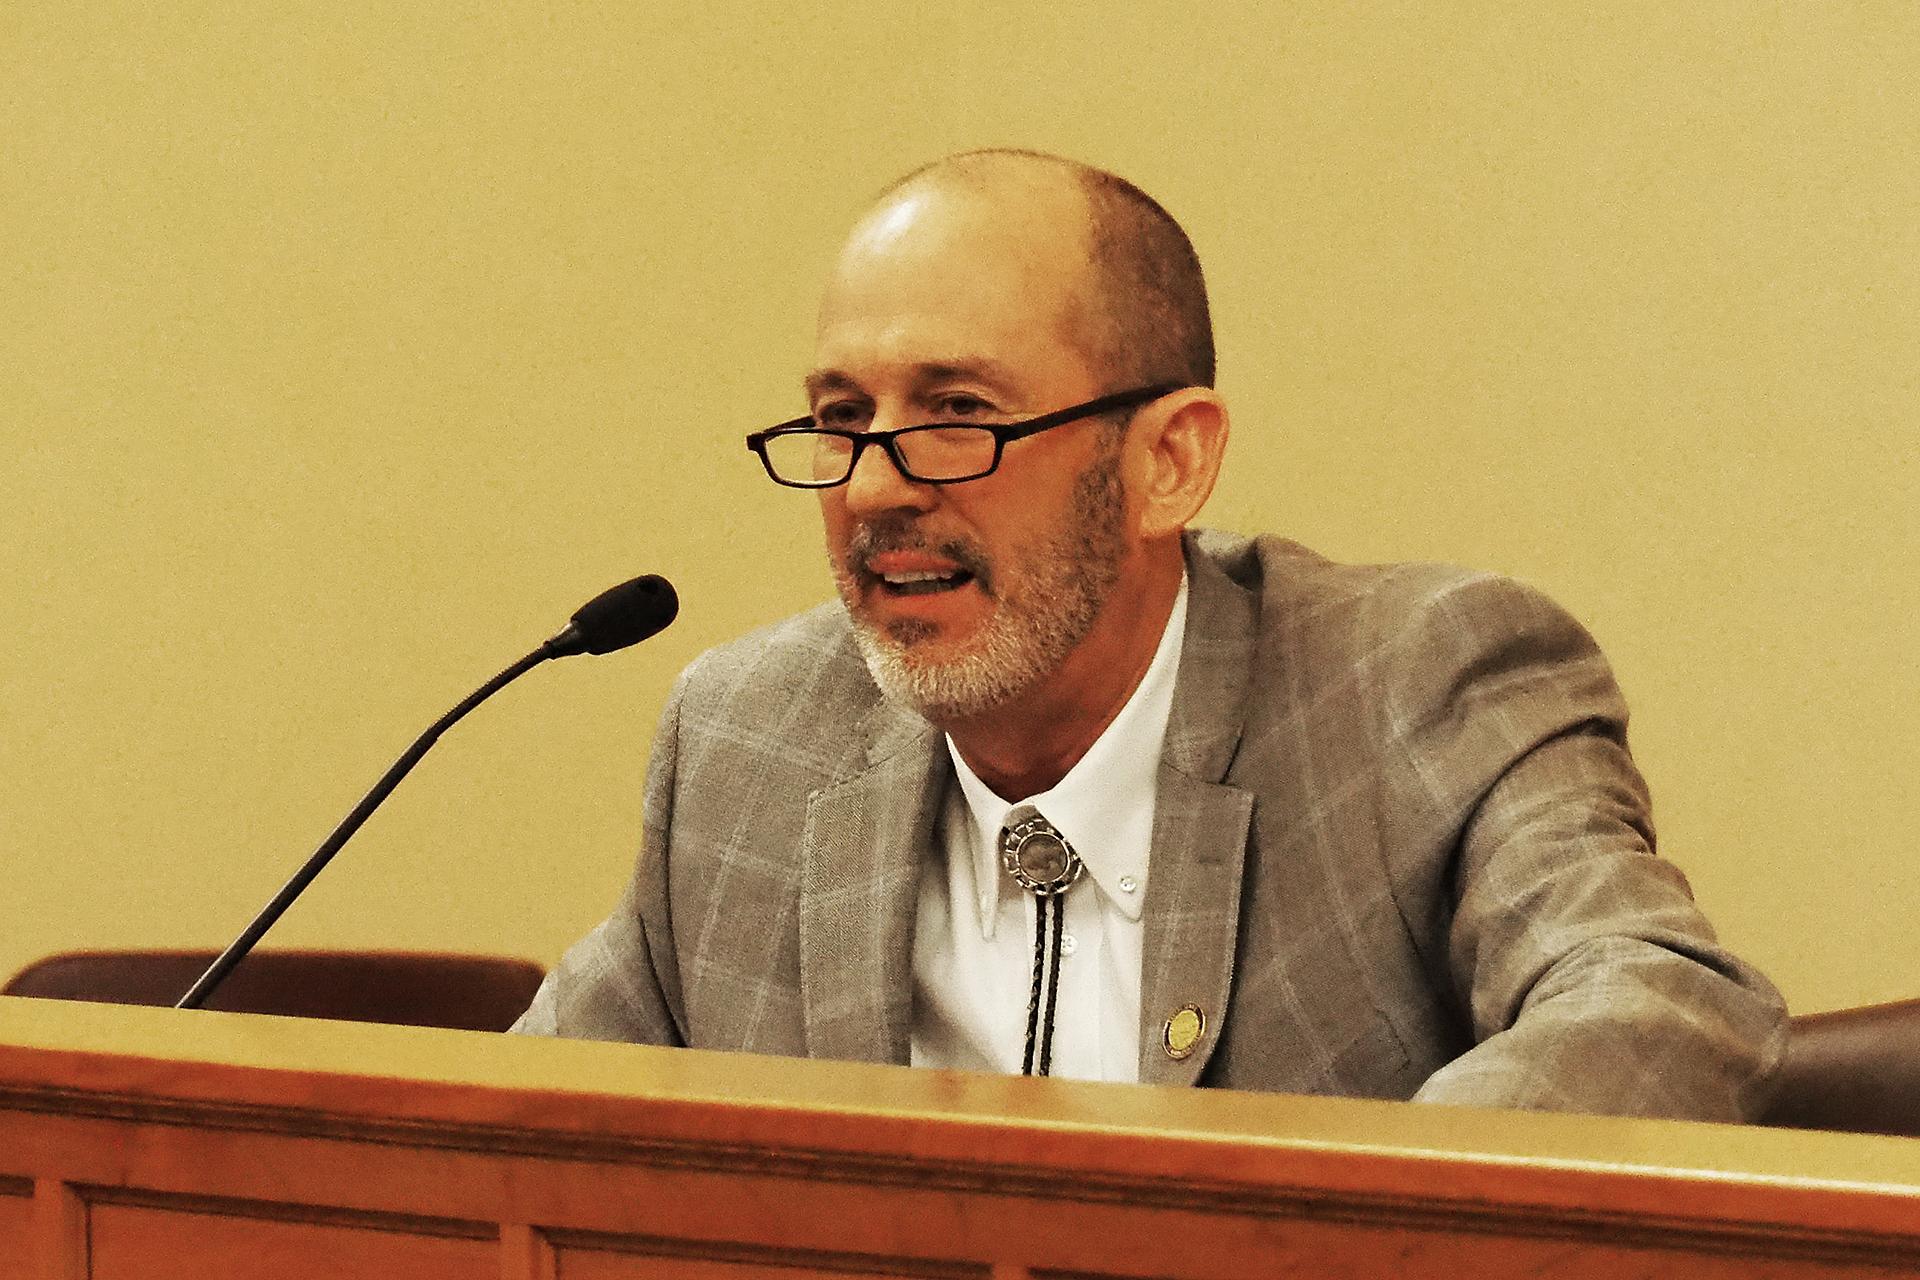 Dear Kansas Board of Healing Arts: This doctor-senator is a threat to public health